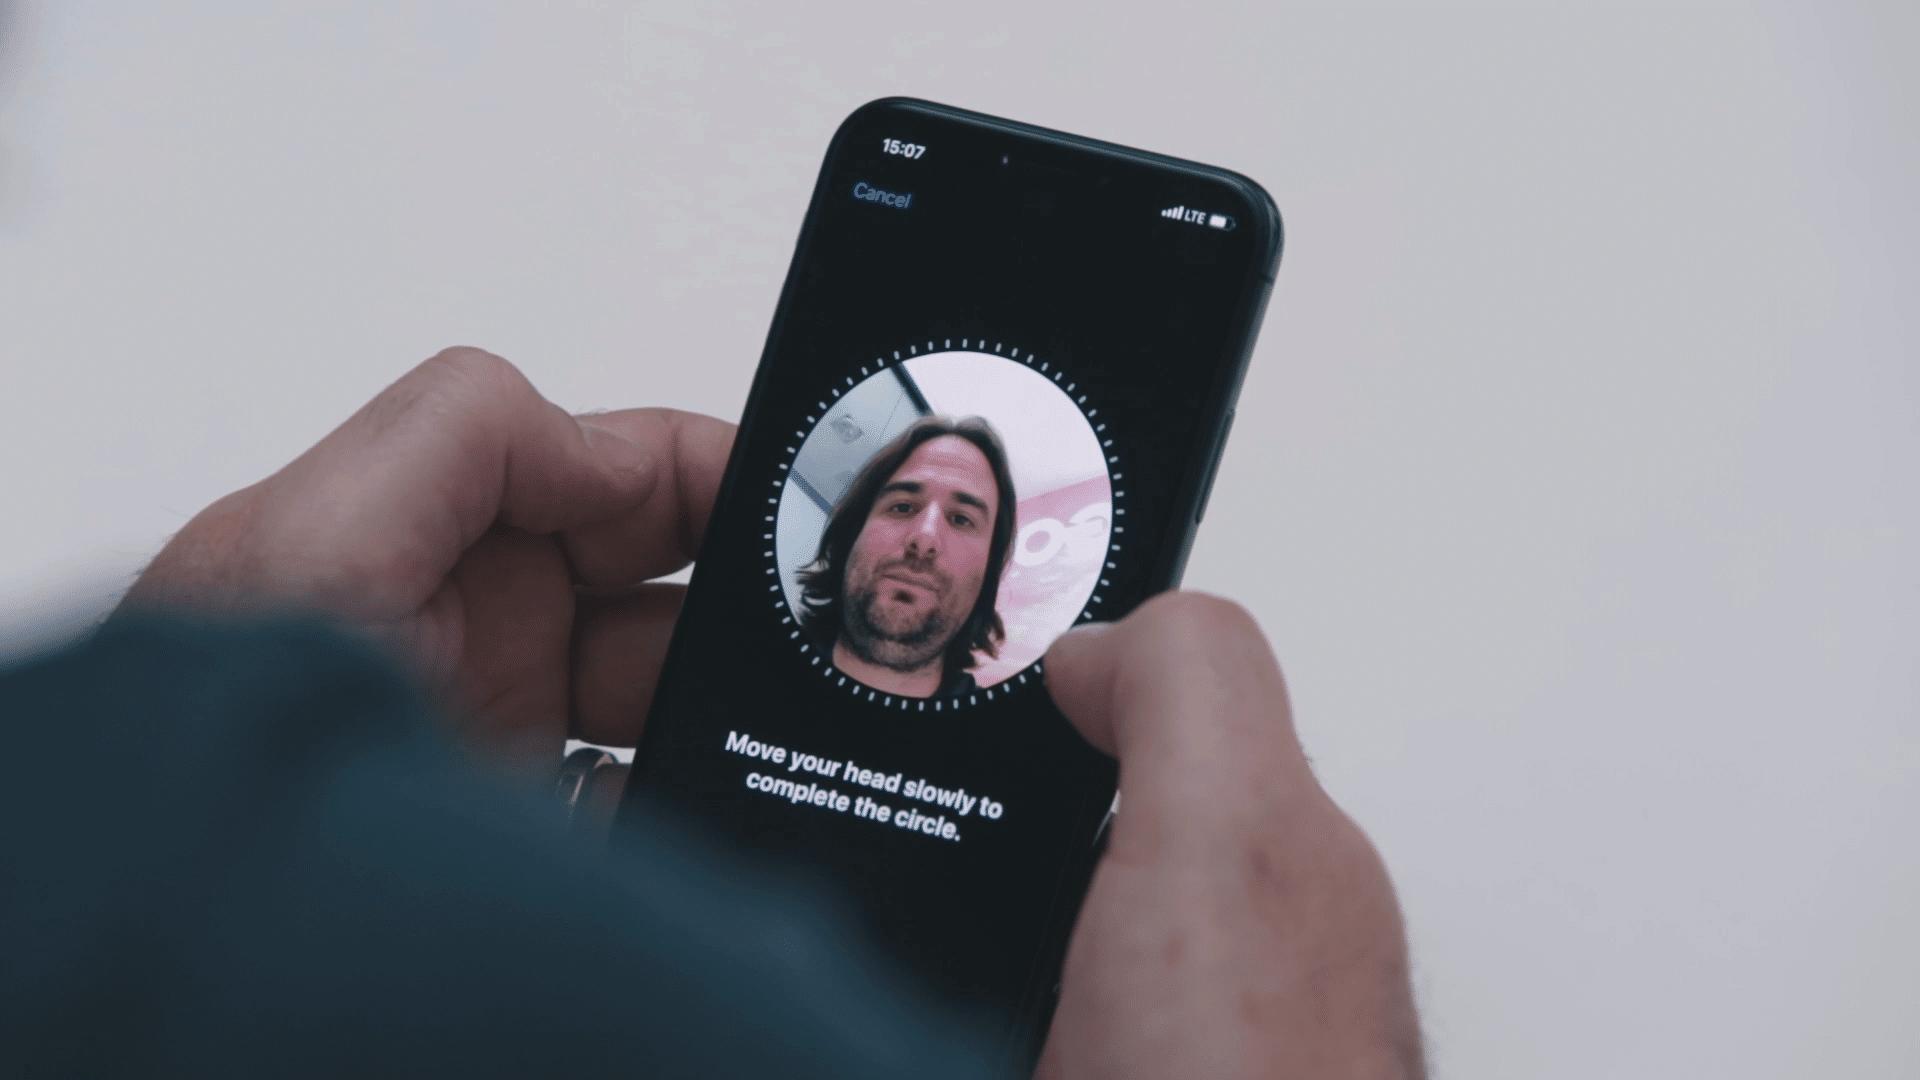 ian biometric authentication HSBC Malta facial recognition